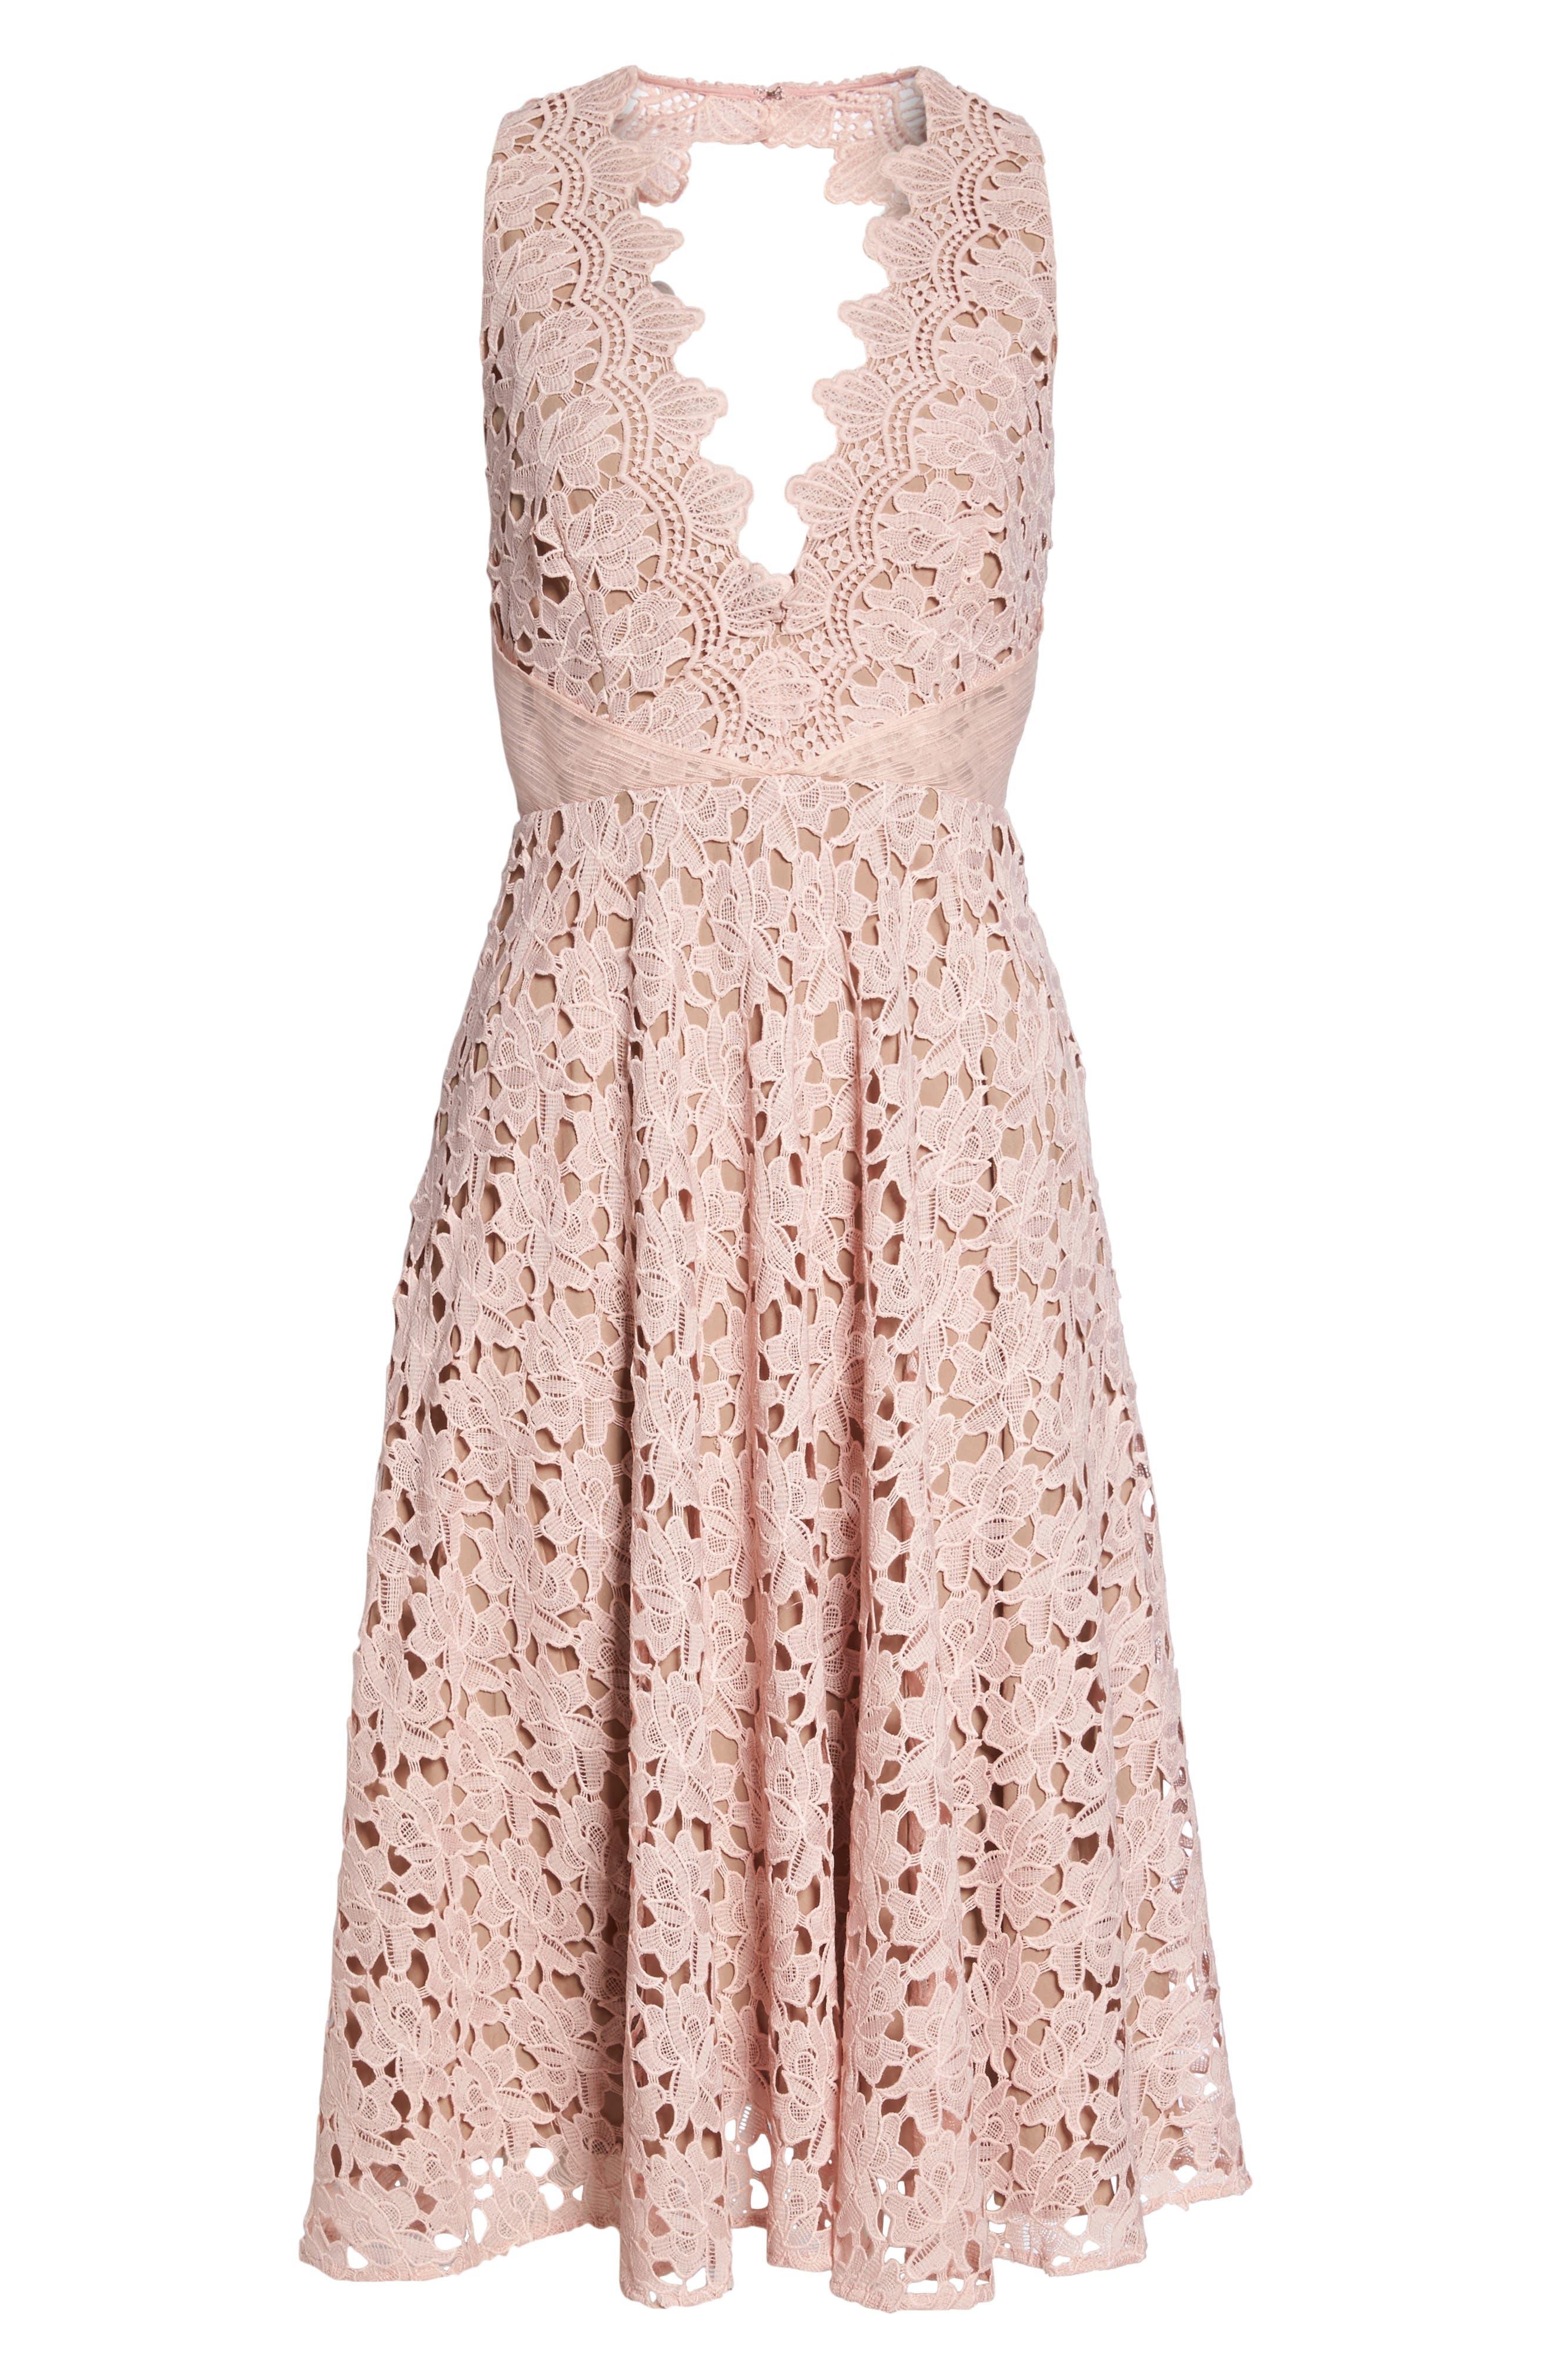 Ashley Guipure Lace Fit & Flare Dress,                             Alternate thumbnail 6, color,                             650